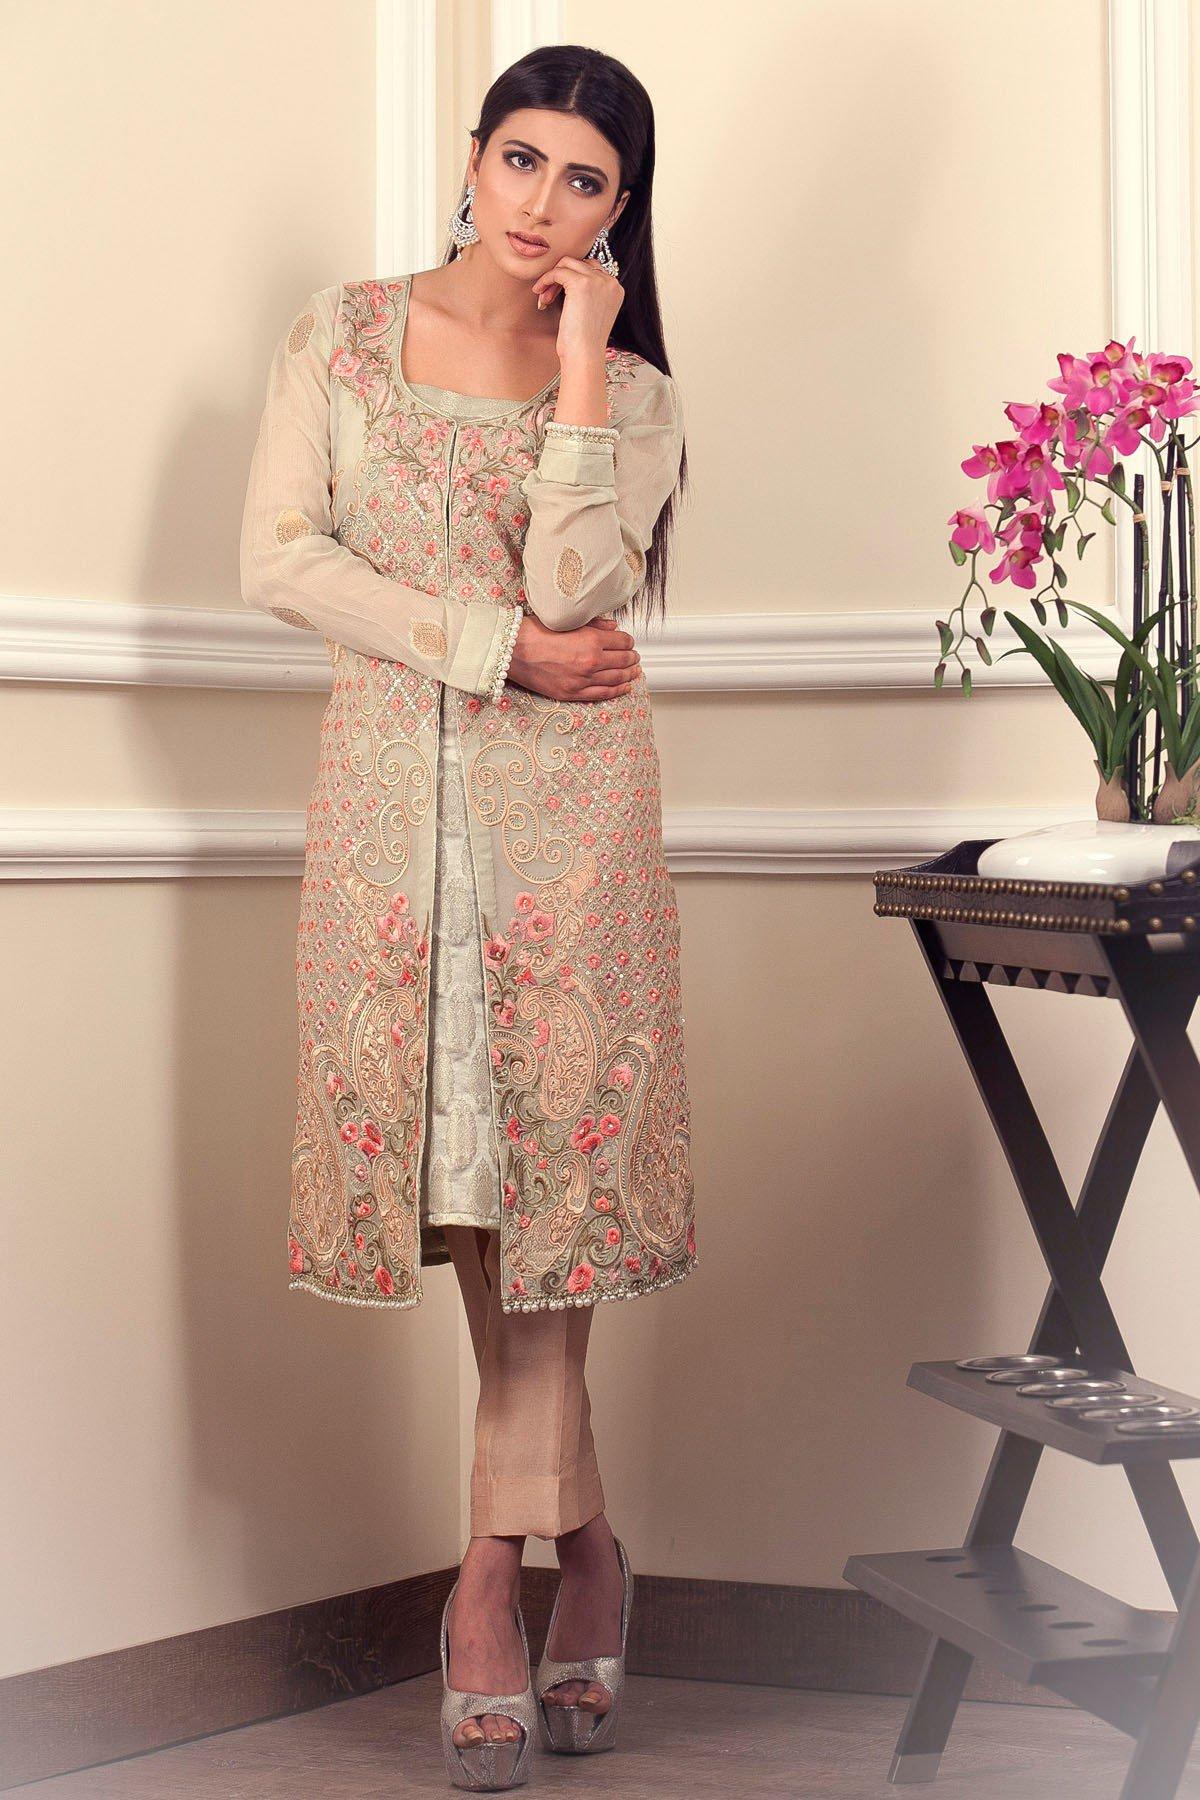 Pakistani Designer Wedding Dresses 2016 Pakistani Designer Wedding - Pakistani Designer Wedding Dresses